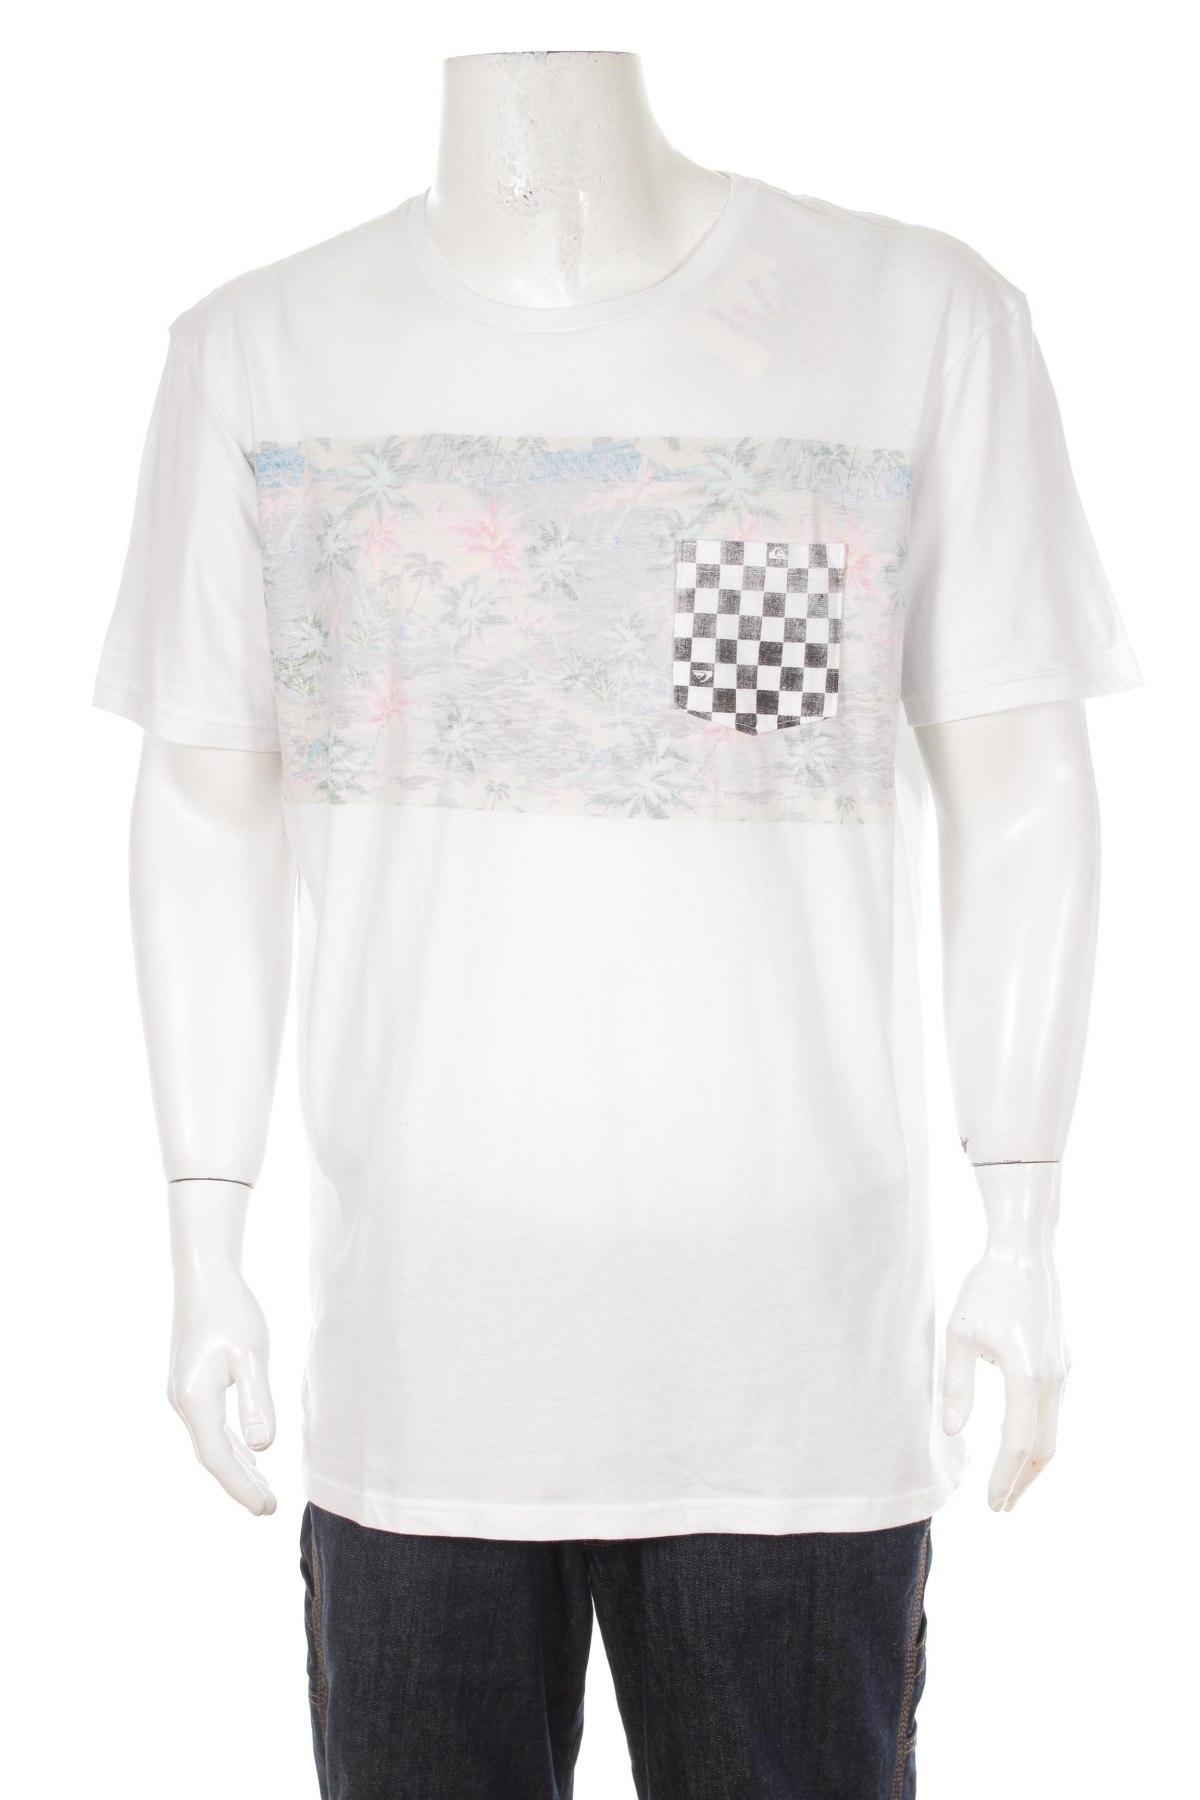 2e2c1a7dd1 Ανδρικό t-shirt Quiksilver - σε συμφέρουσα τιμή στο Remix -  6299507